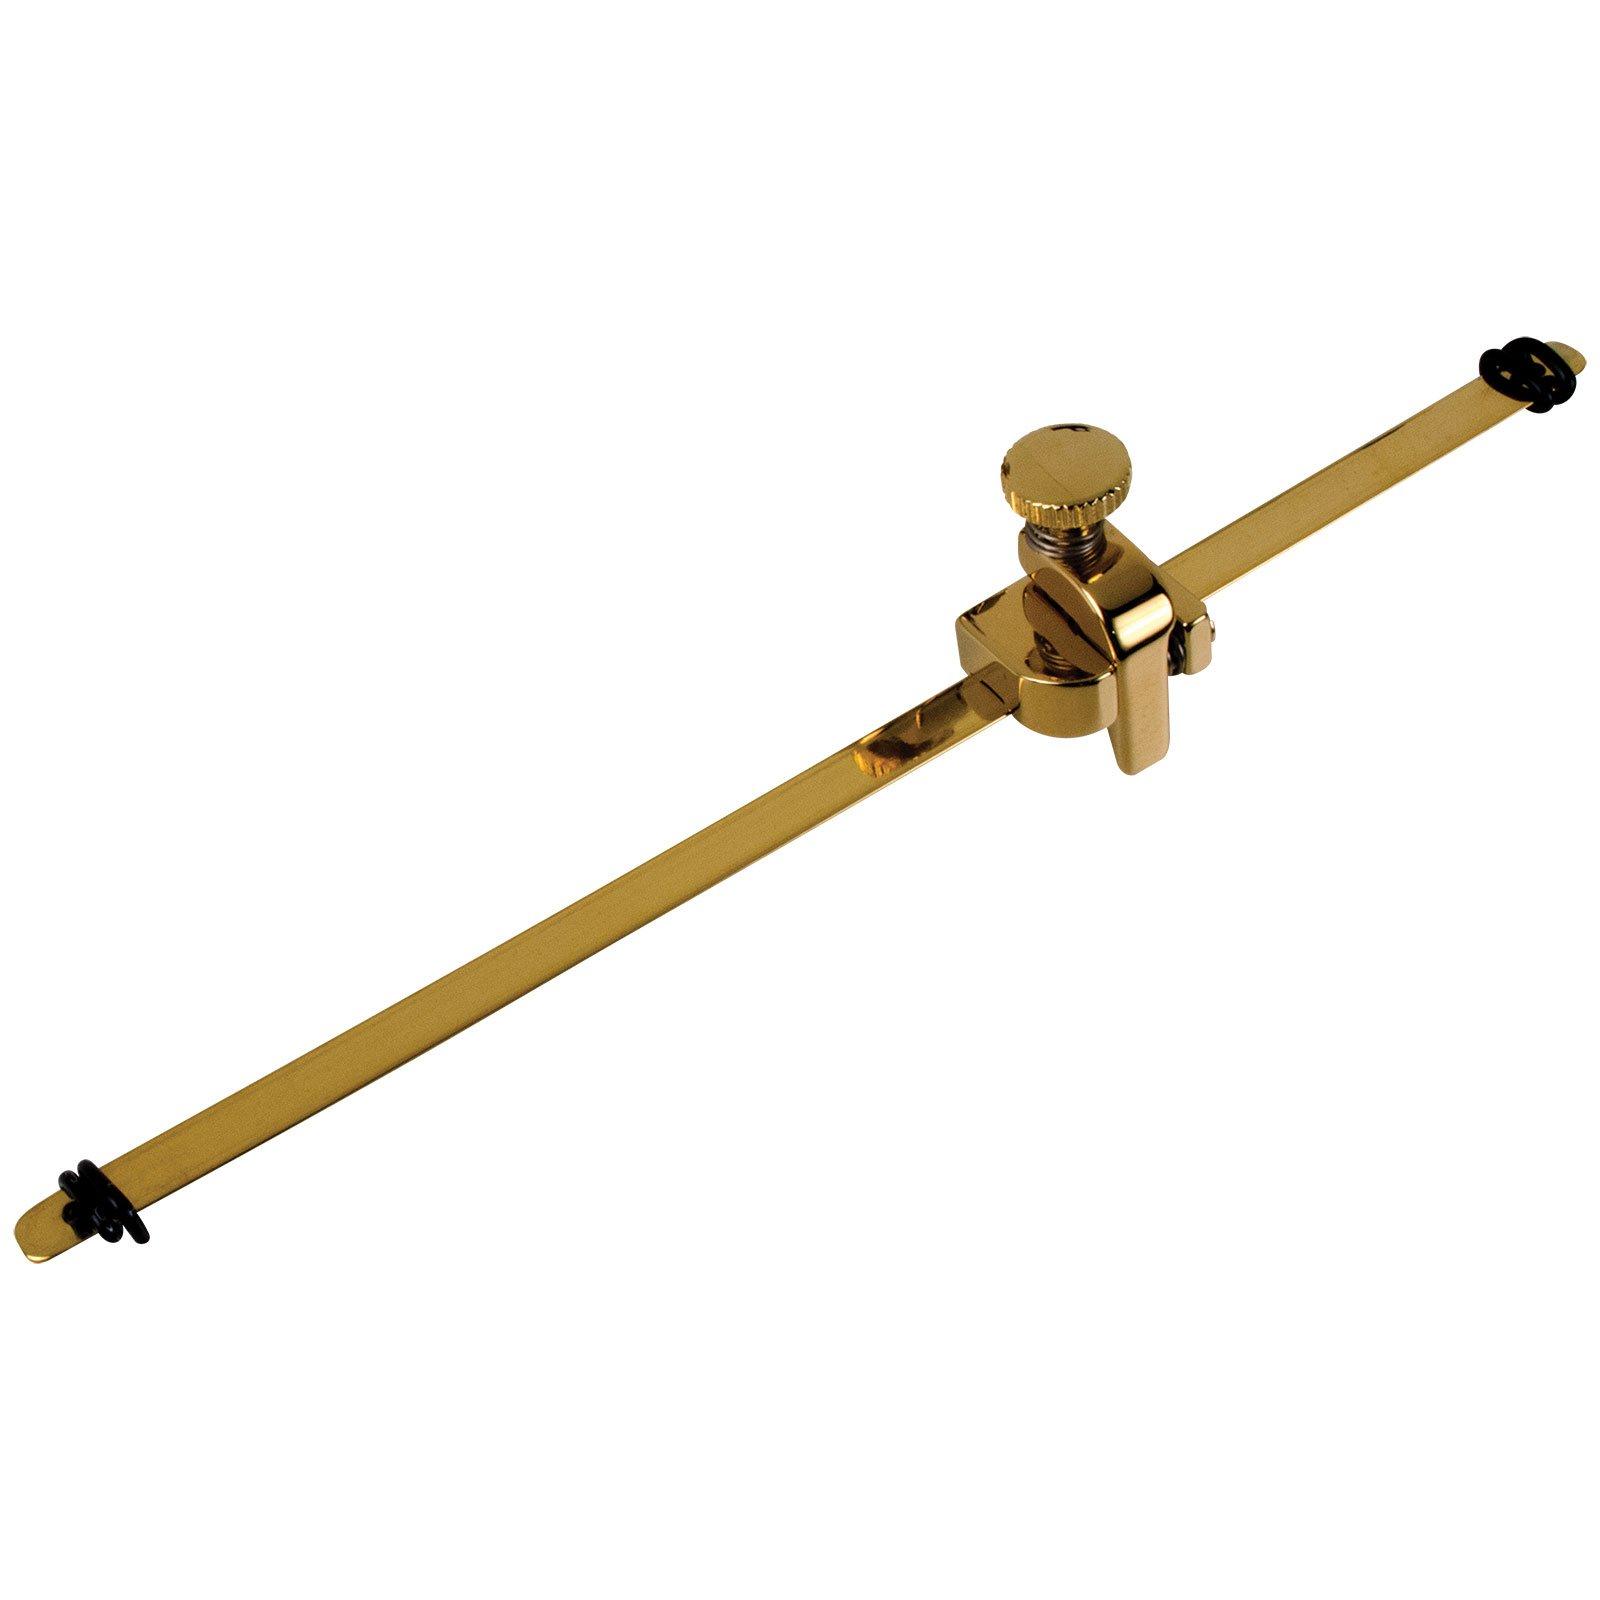 Shubb BC-25G (FSG) 5th String Banjo Capo - Gold